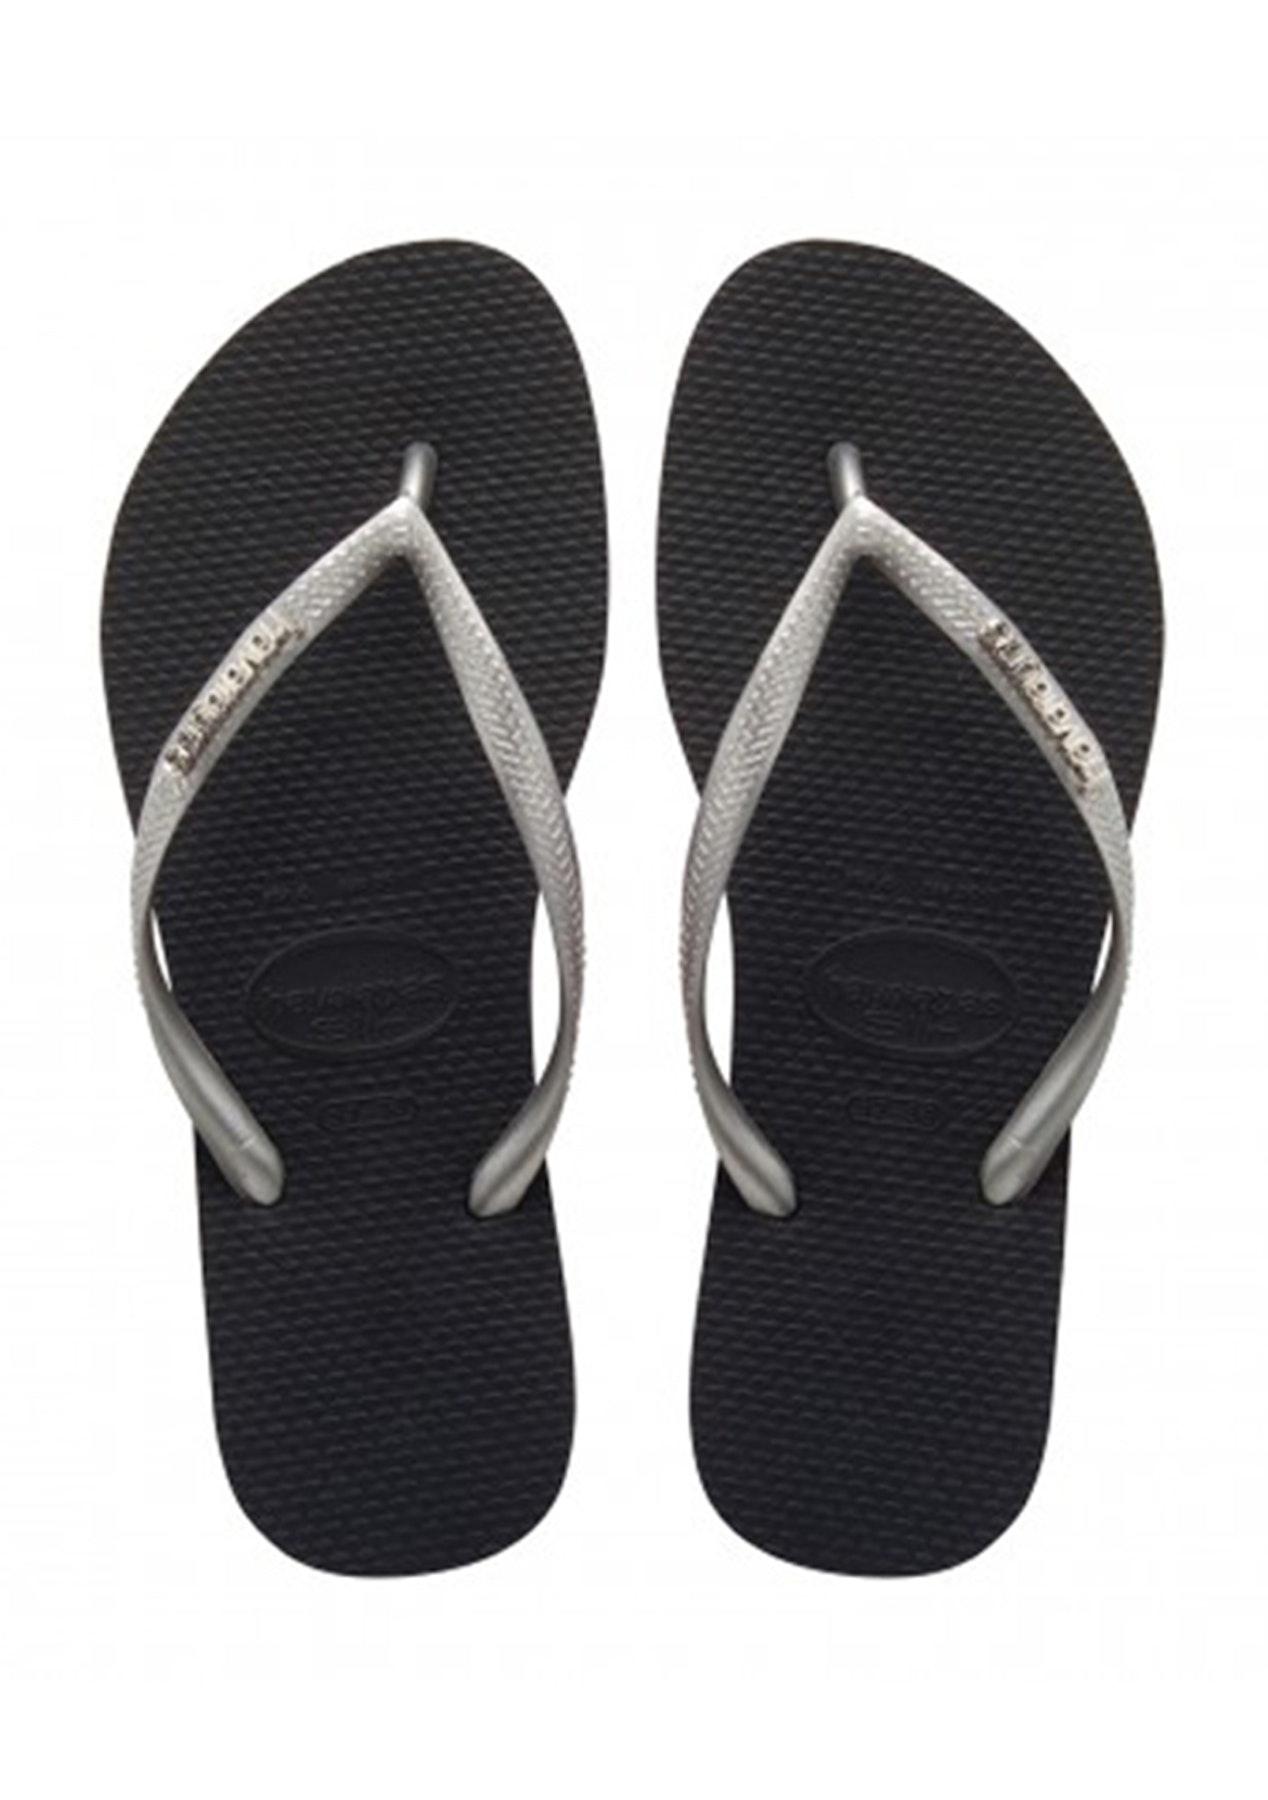 7b95cb339 Havaianas - Slim Logo Metallic 3761 - Black   Silver   Silver - Havaianas  Flash Sale - Onceit